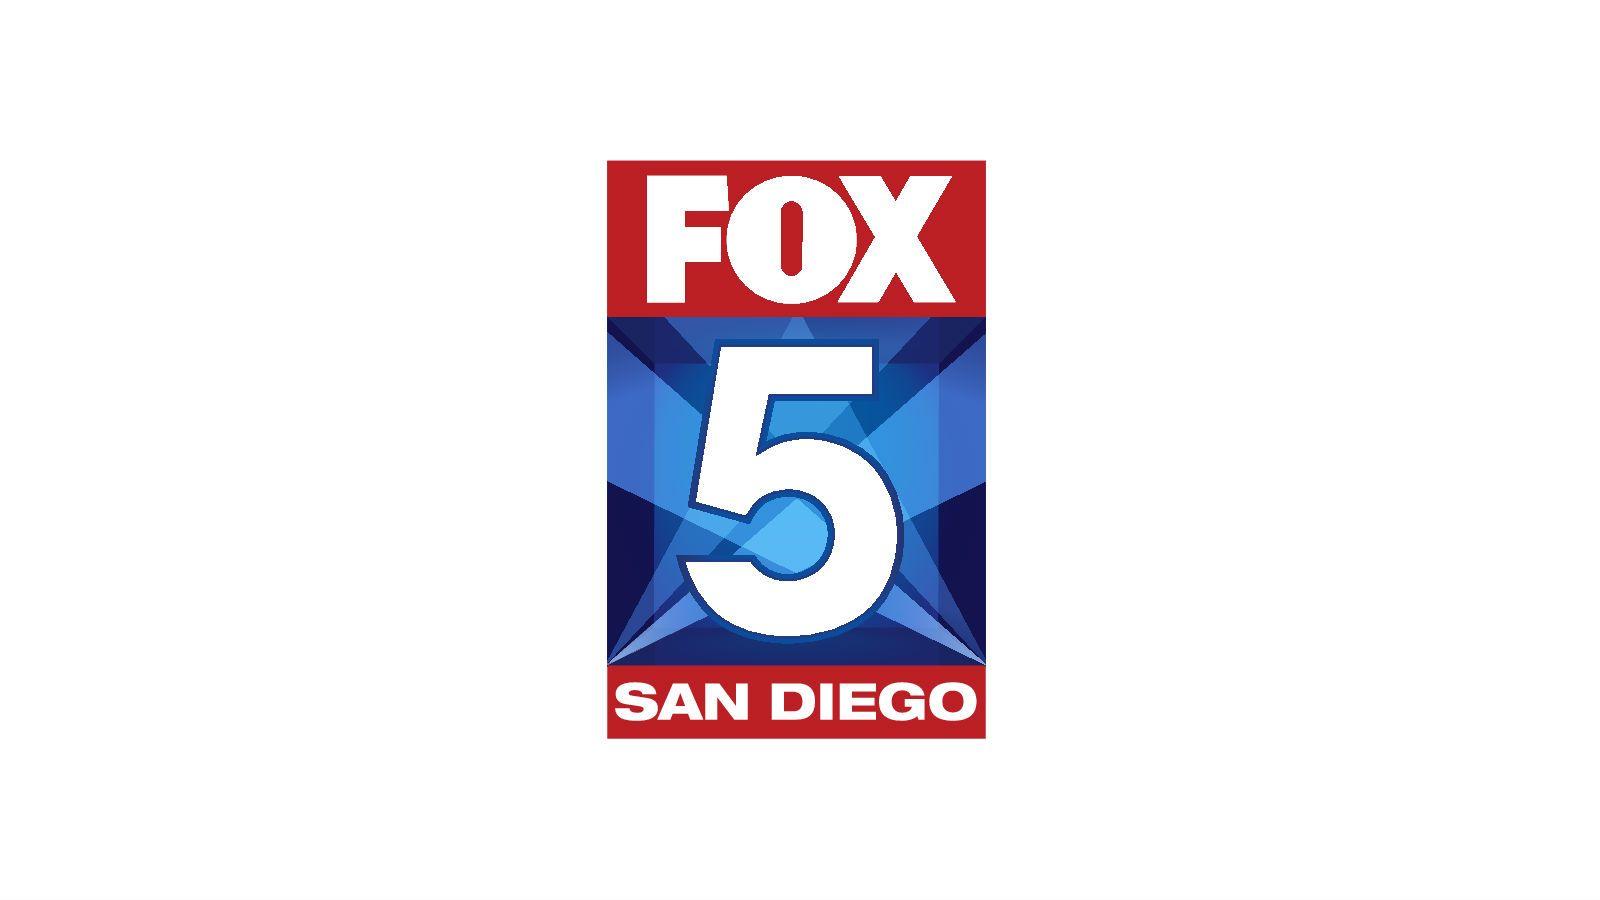 Fox 5 San Diego, Wednesday Mornings